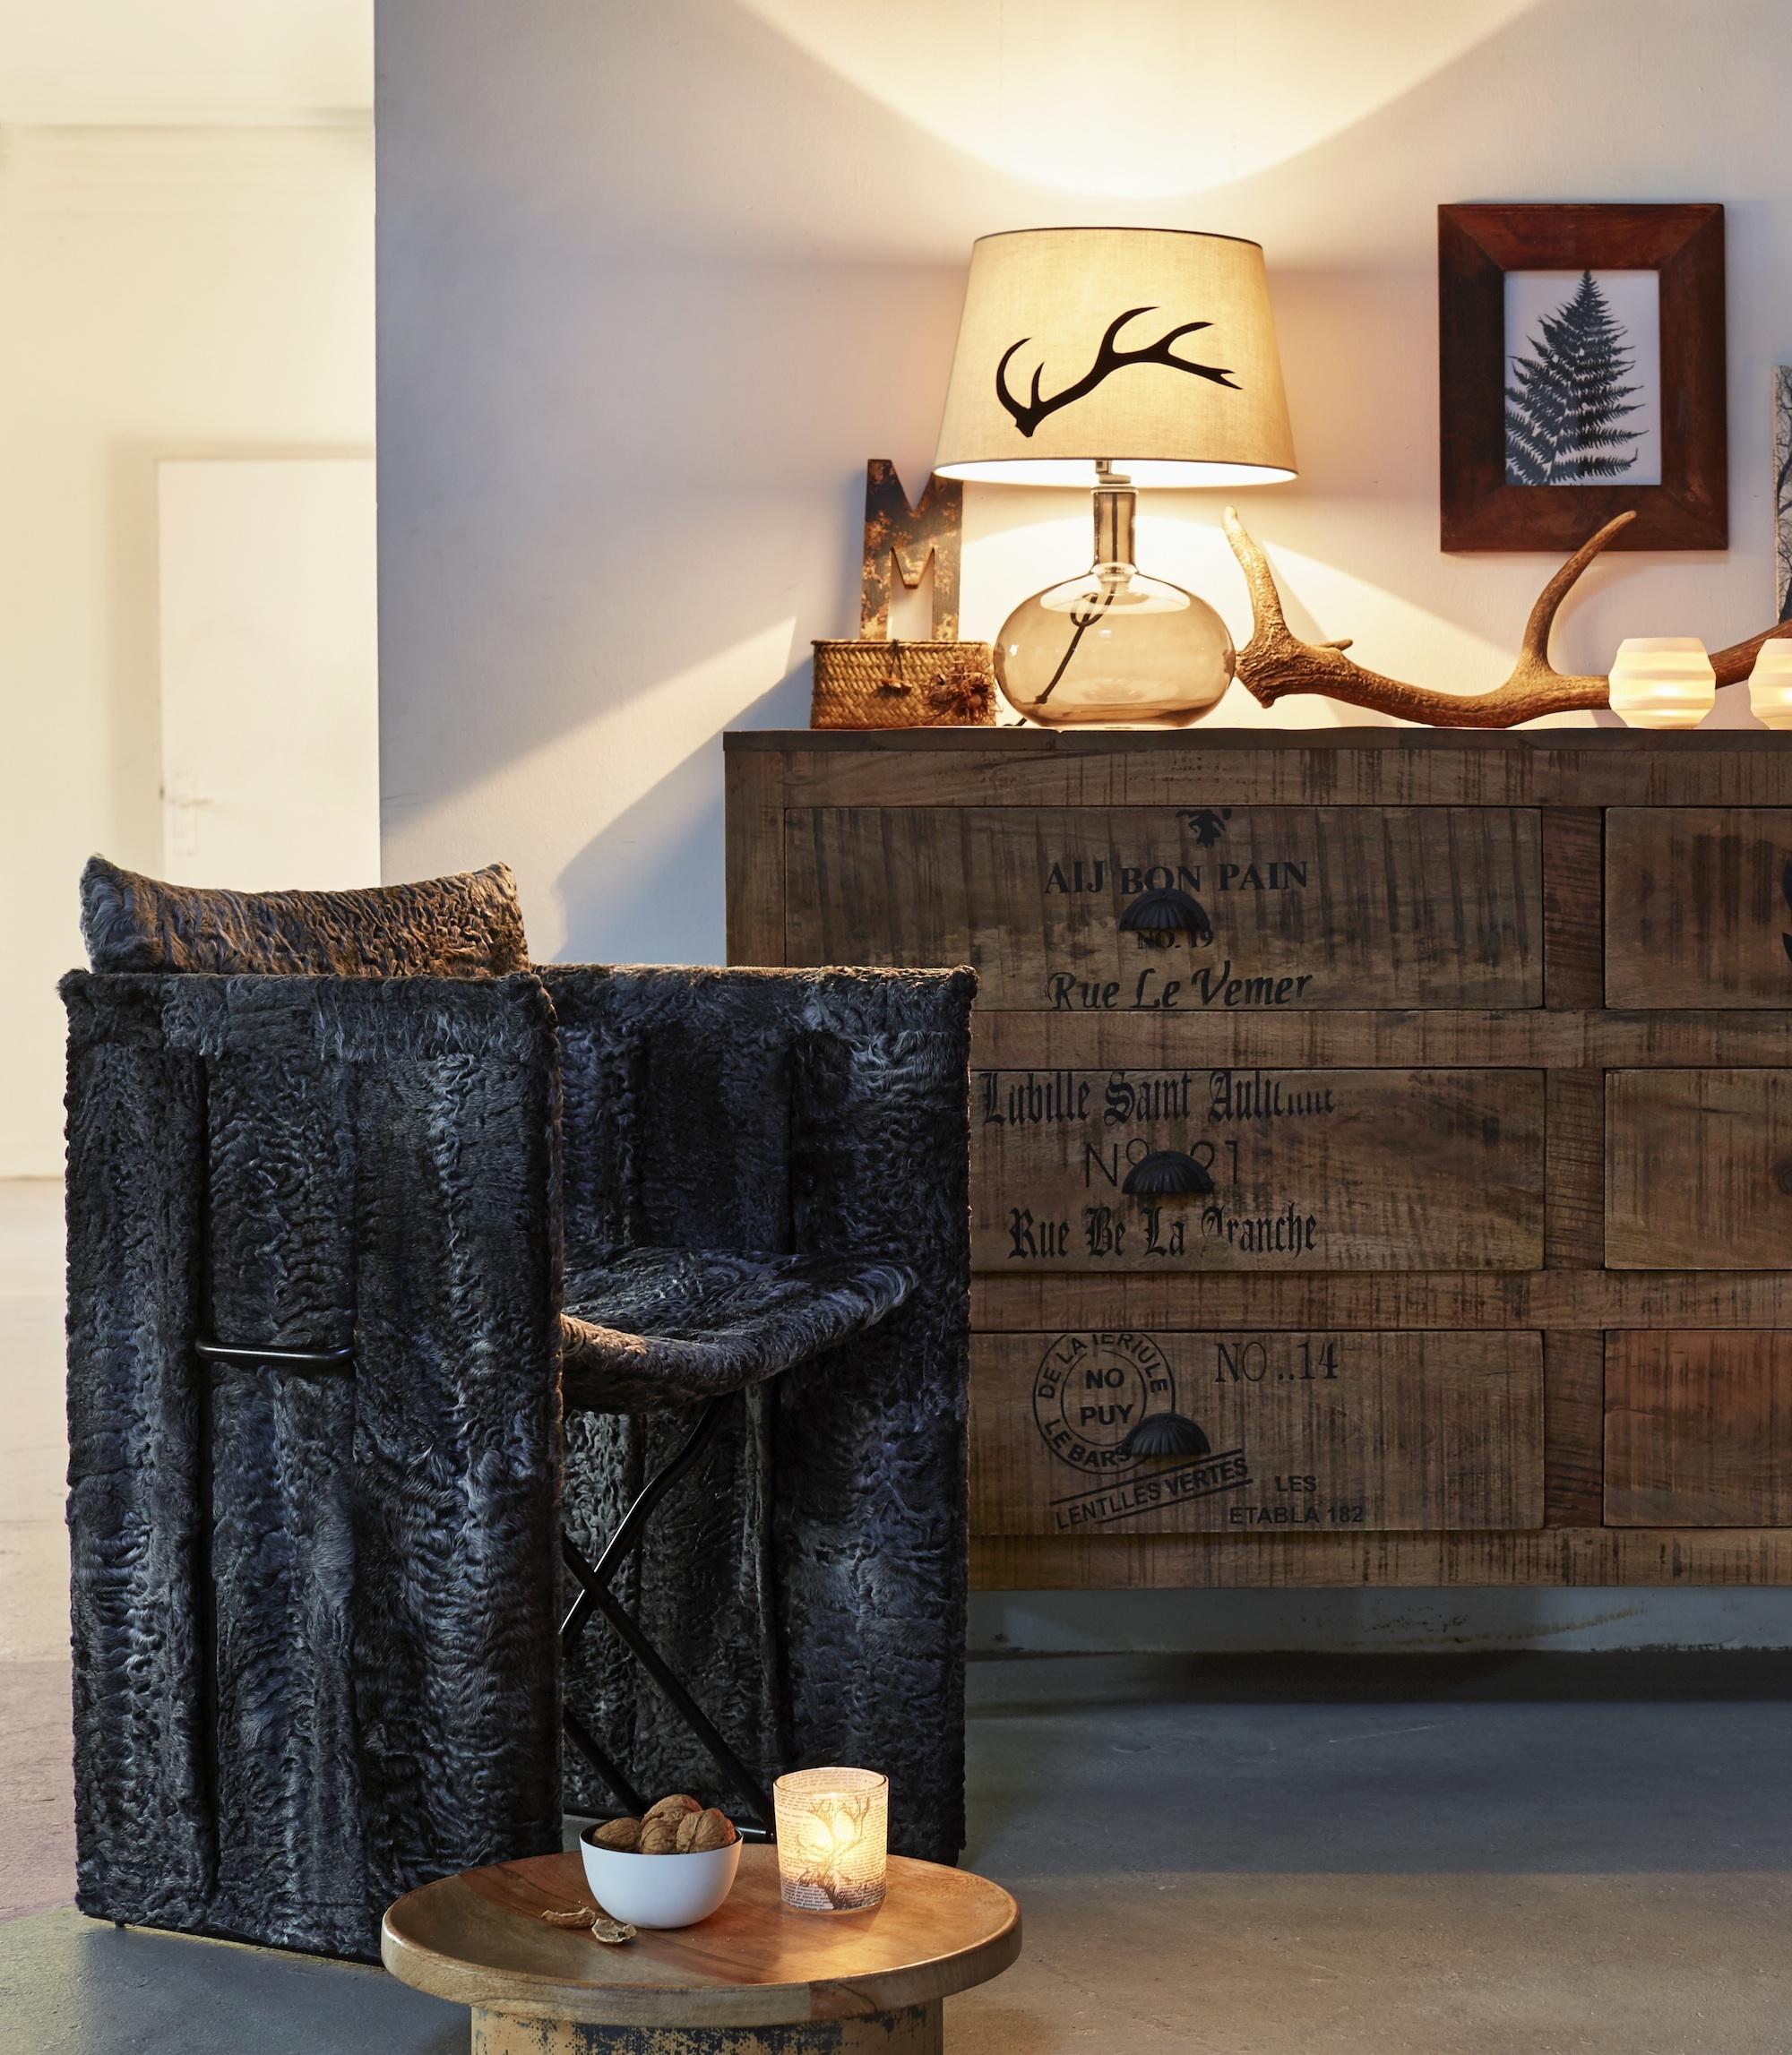 upcycling alte pelze werden zu st hlen. Black Bedroom Furniture Sets. Home Design Ideas